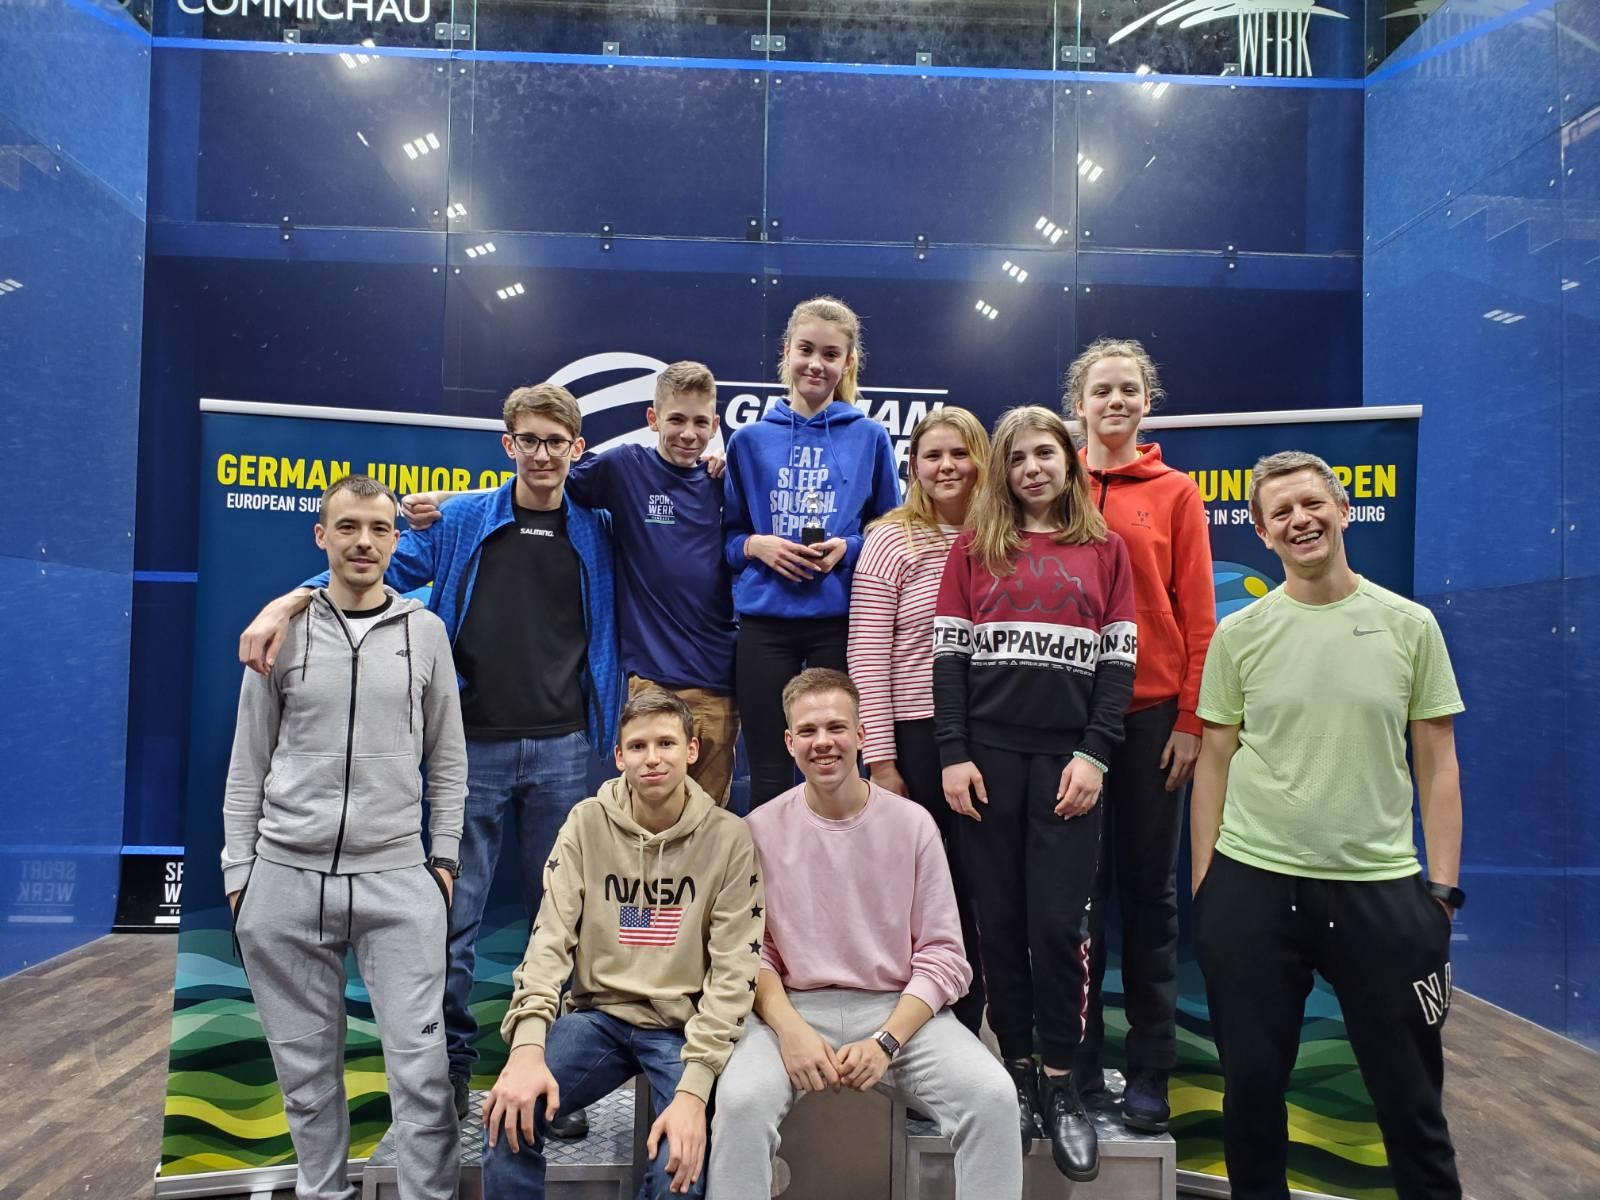 German Junior Open 2020: Christina Begeba took bronze at the Super Series tournament